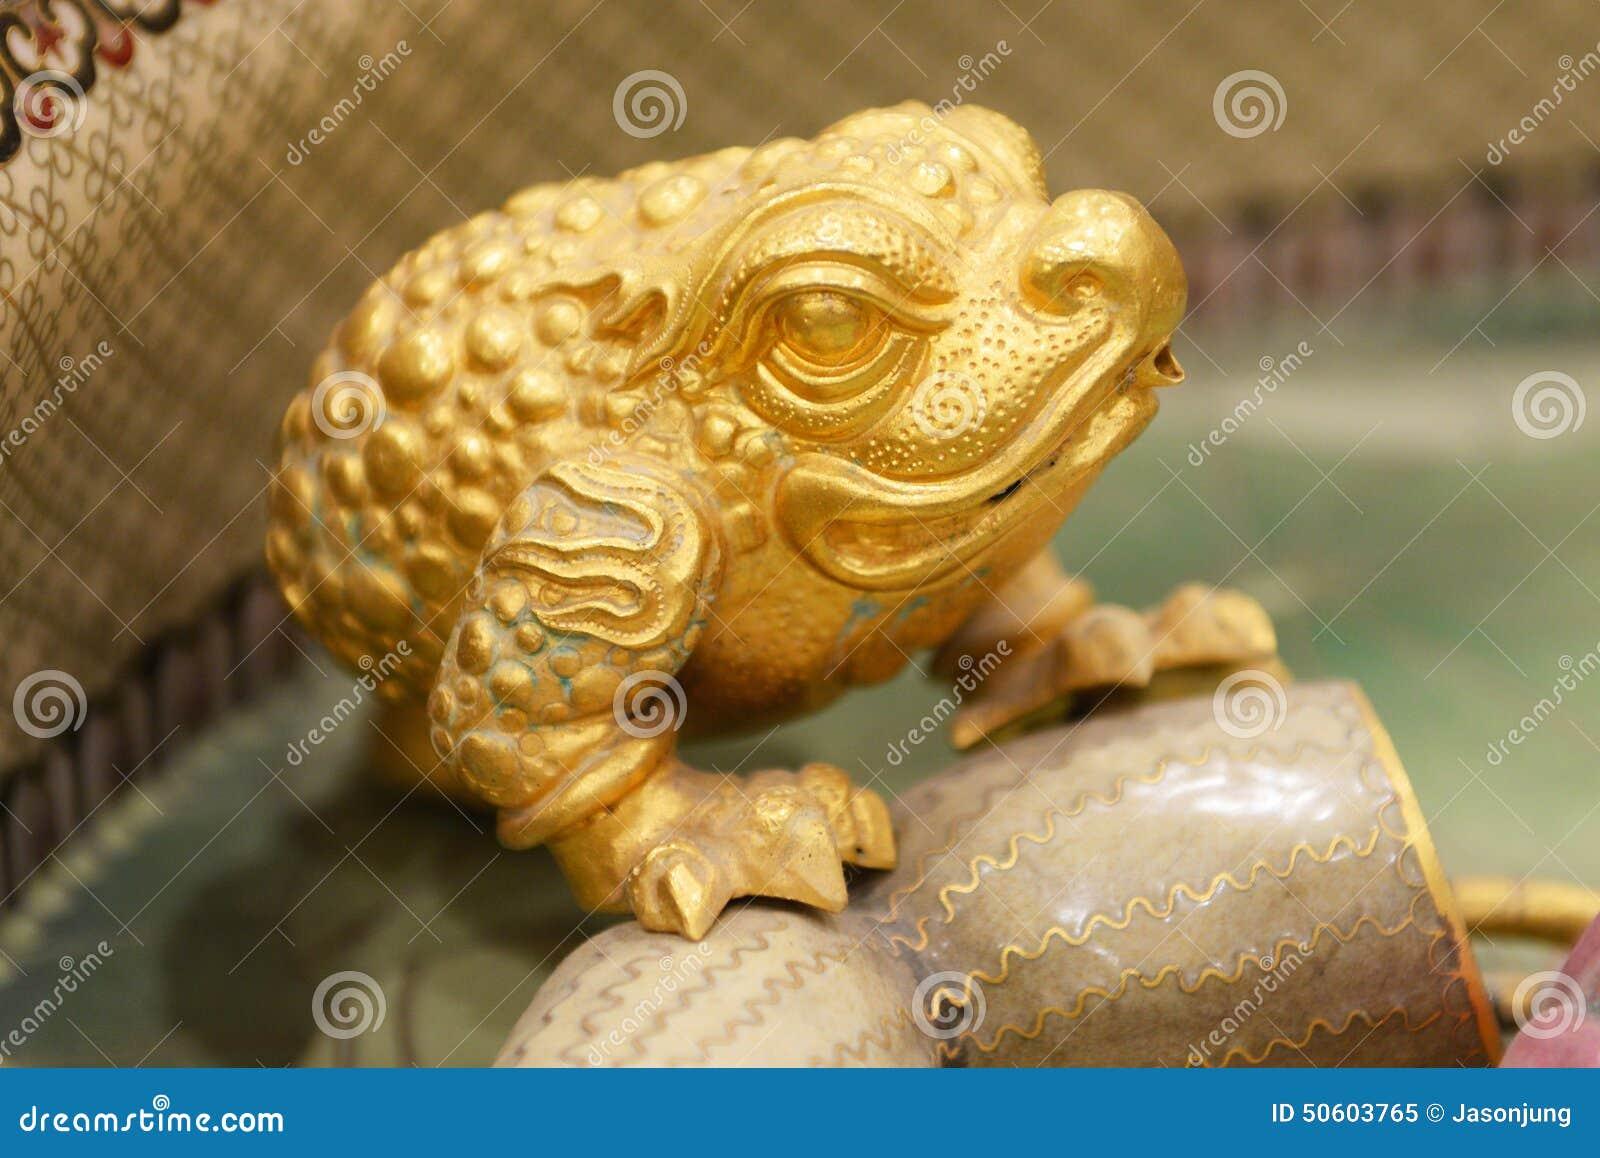 handycraft of golden toad stock image image of factory 50603765